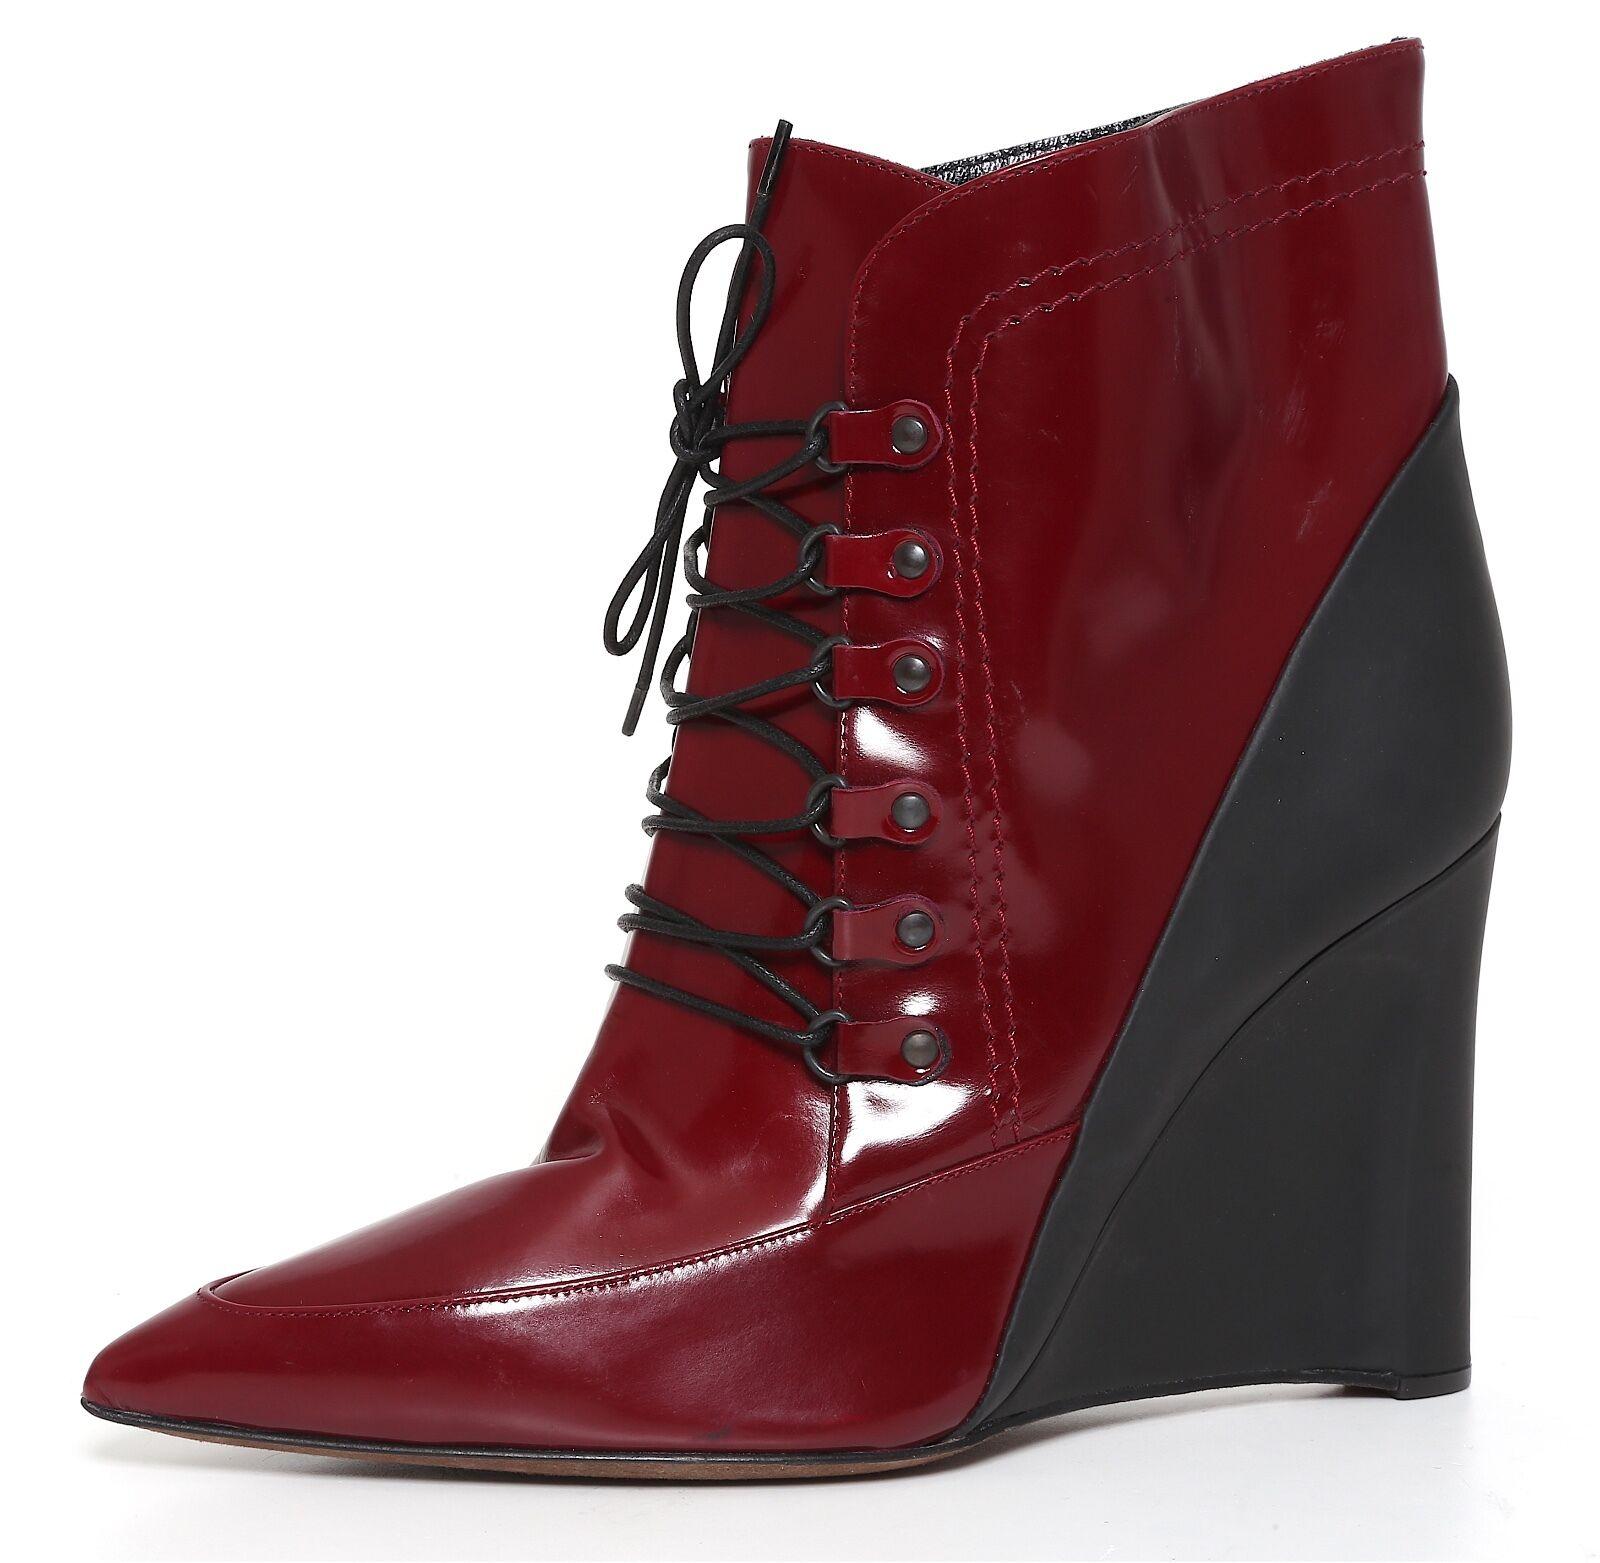 Derek Lam Wedge Heel Booties Patent Leather Burgundy Women Sz 7 B 1428